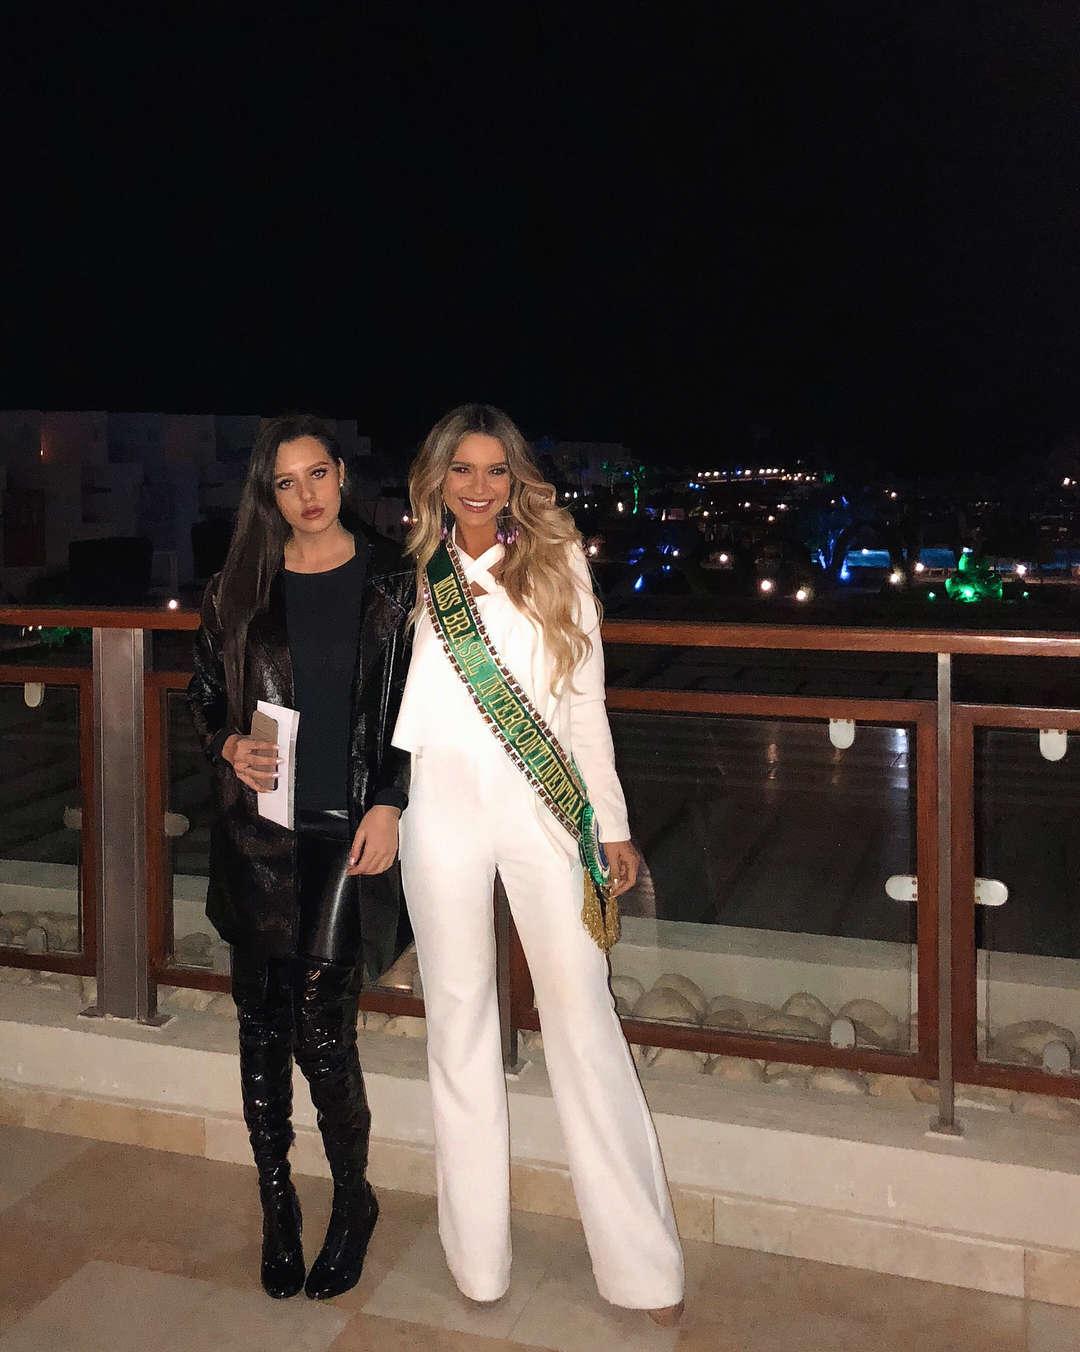 amanda cardoso, miss grand espirito santo 2019/3rd runner-up de miss intercontinental 2017. - Página 2 25039311